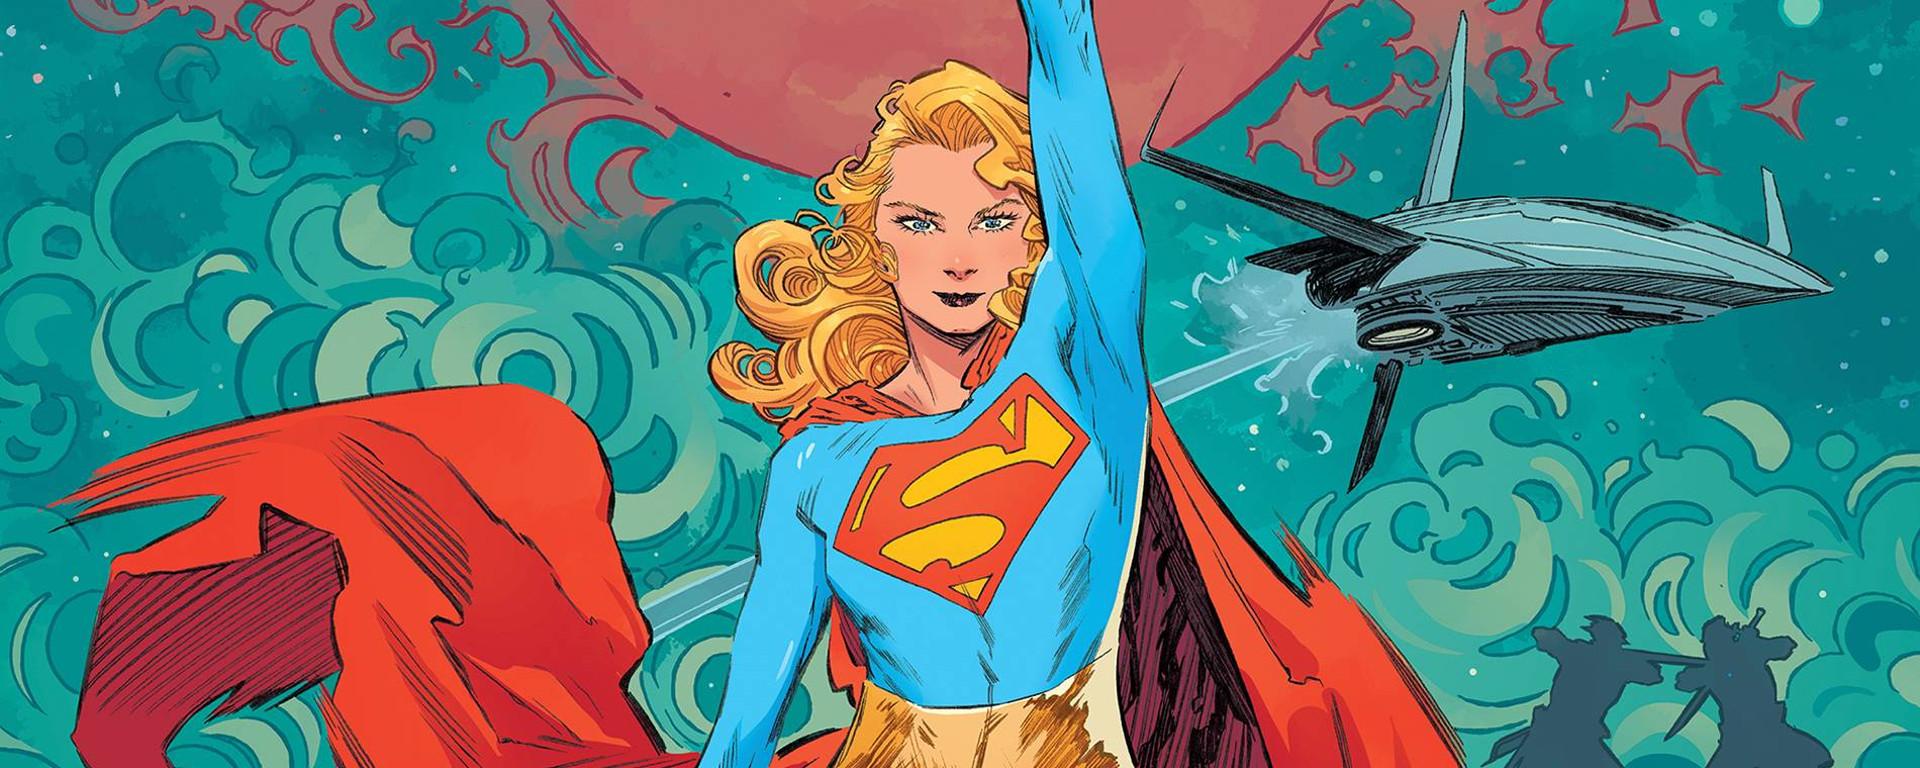 Supergirl Woman Of Tomorrow #1 Header